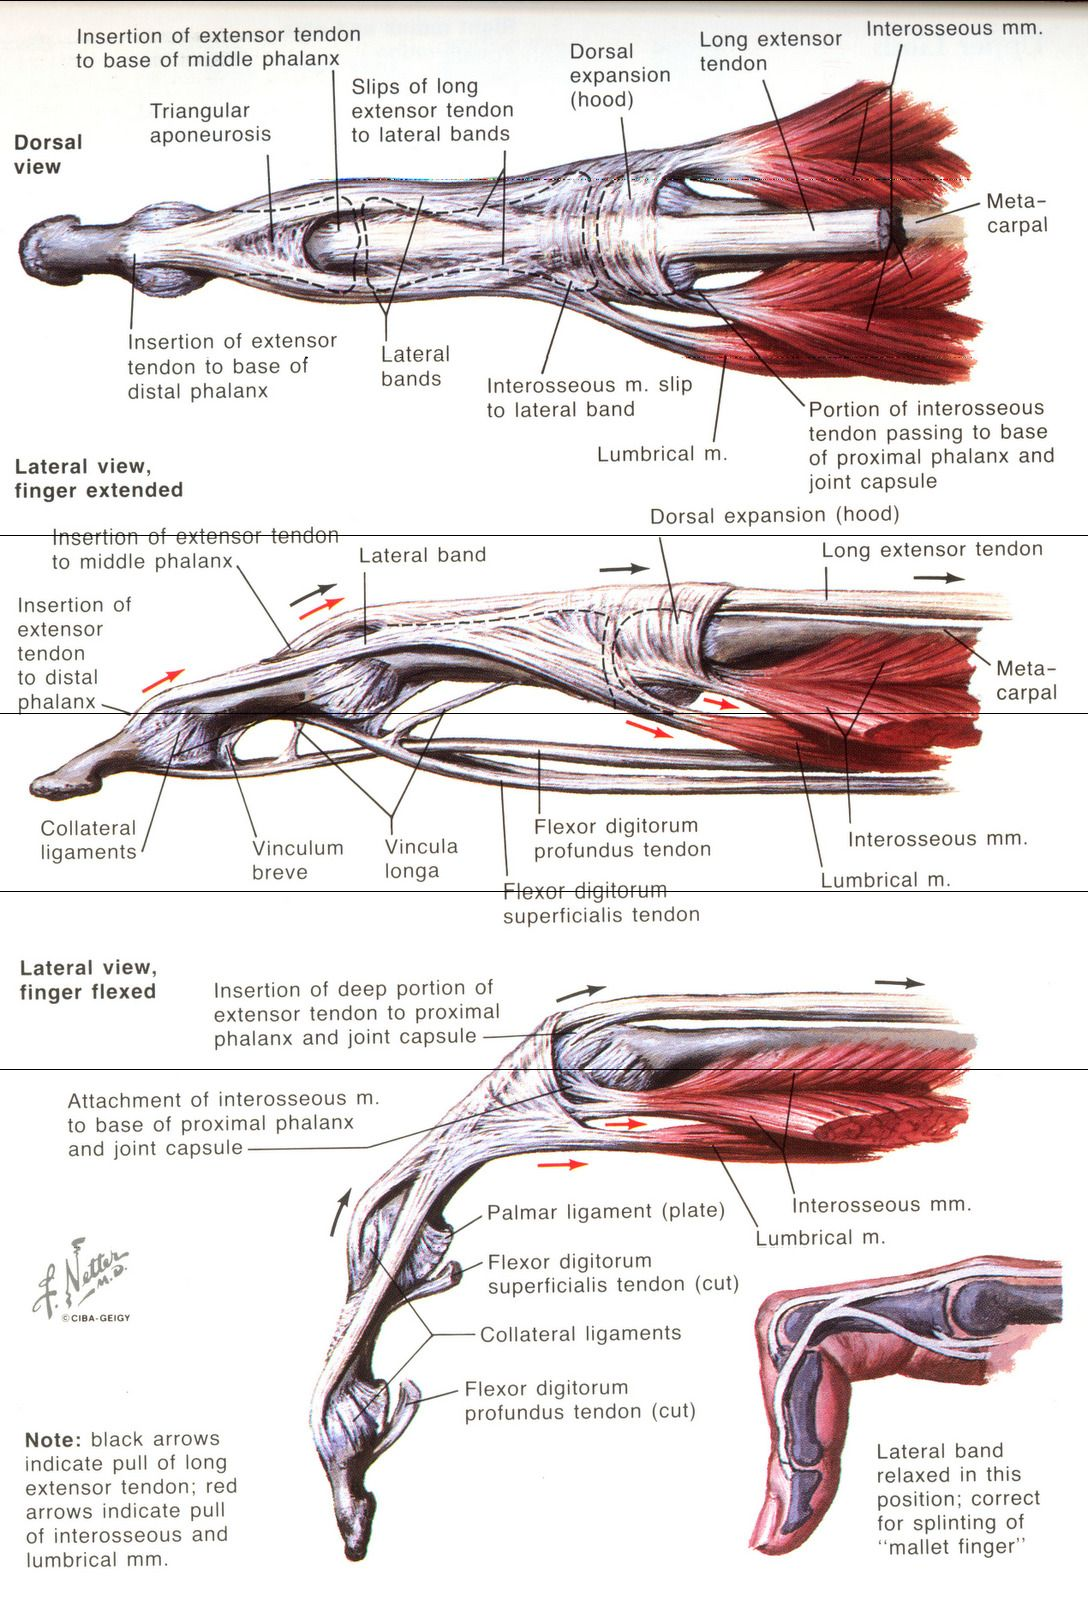 Pin de gabi bala en Physio2 | Pinterest | Anatomía, Fisioterapia y ...